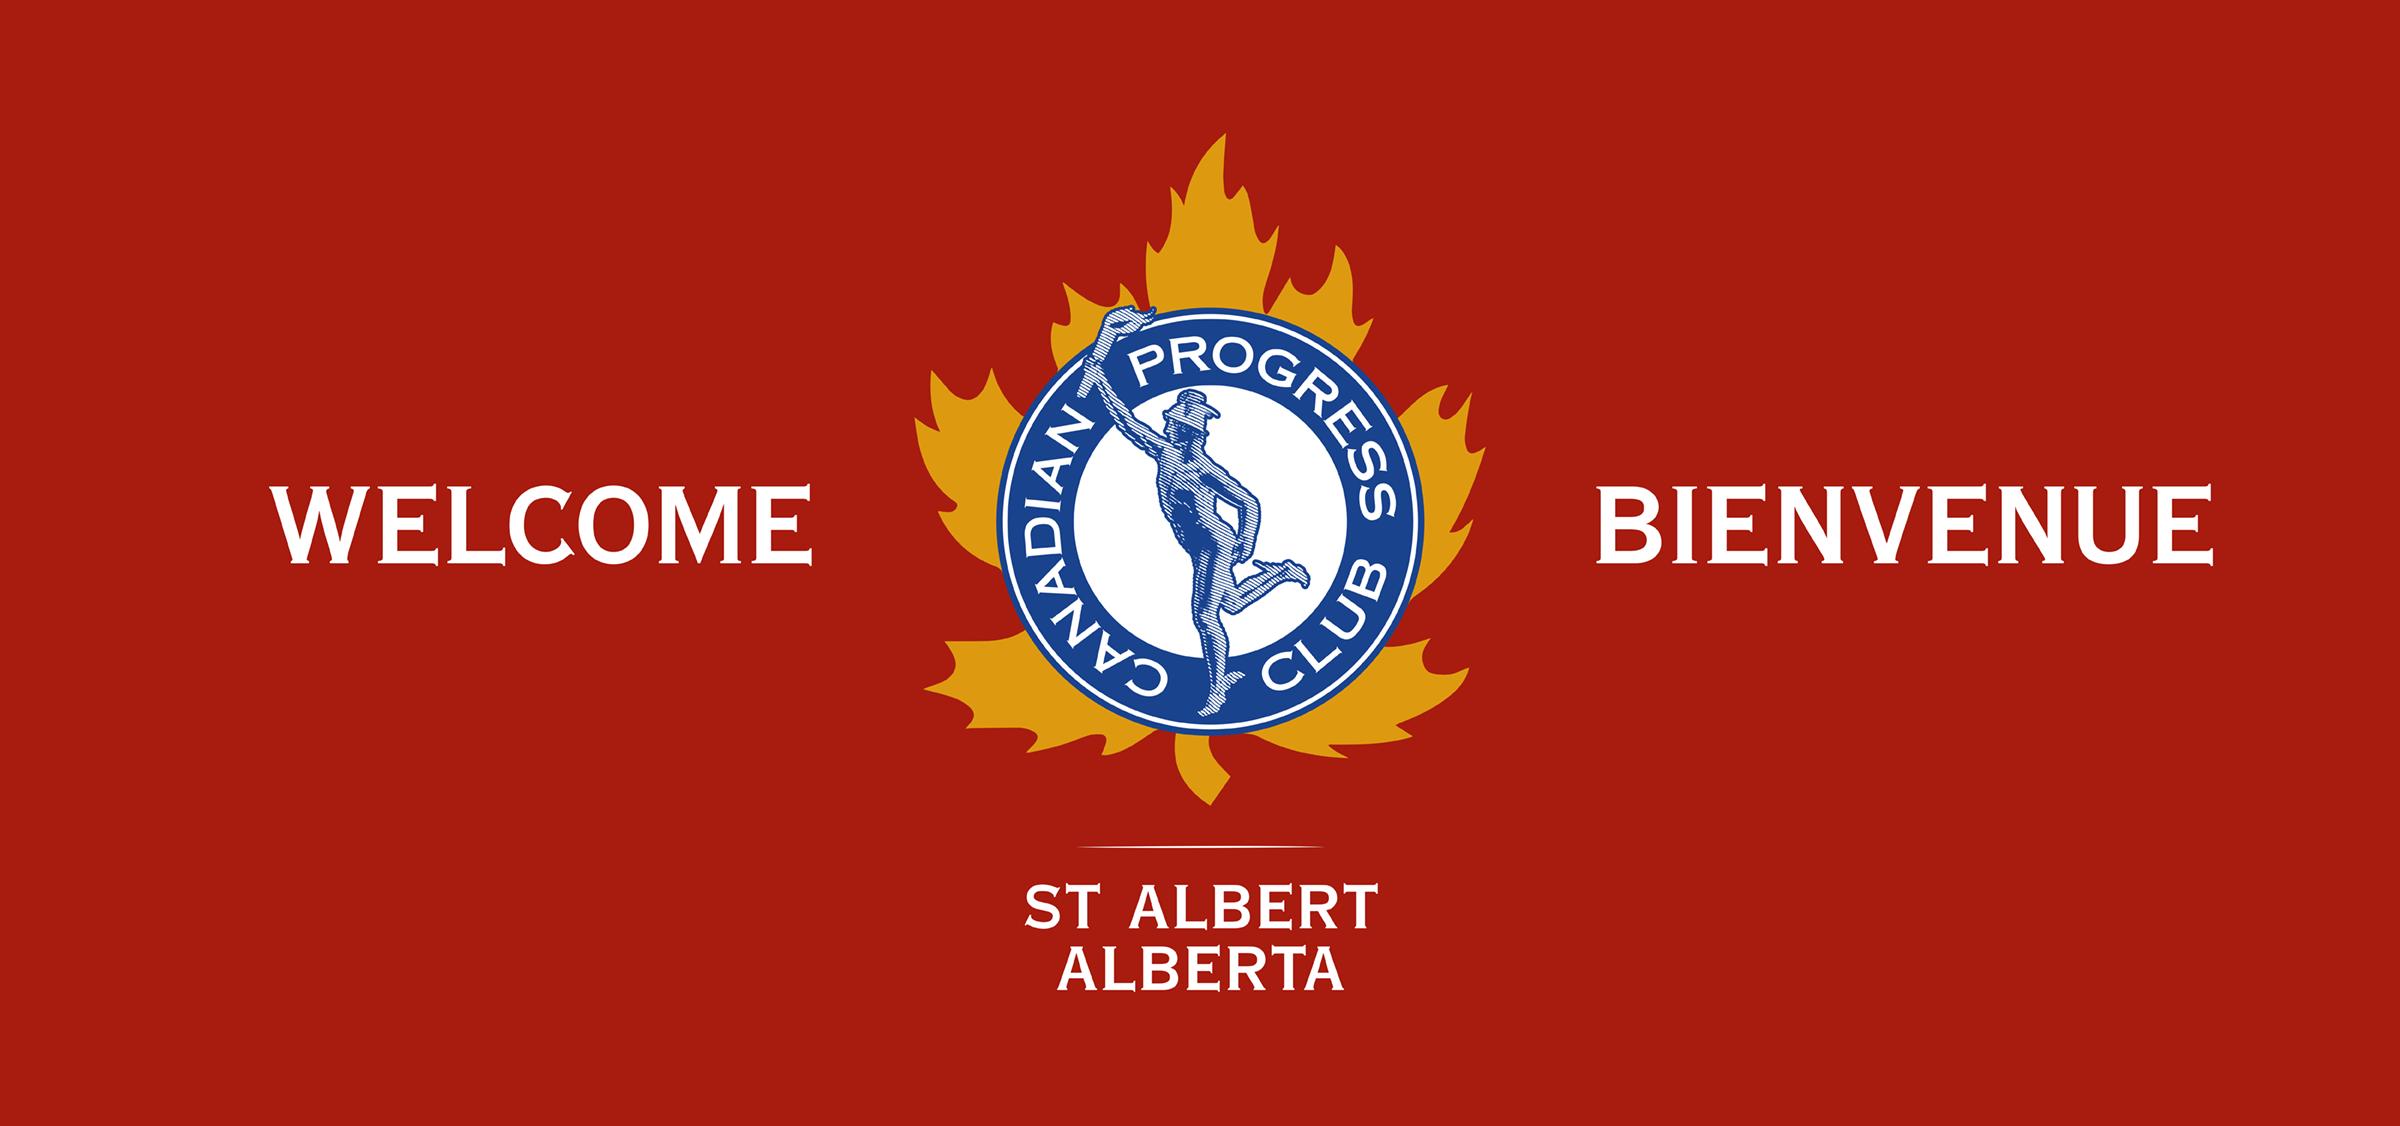 Canadian Progress Club · St  Albert, Alberta – Through